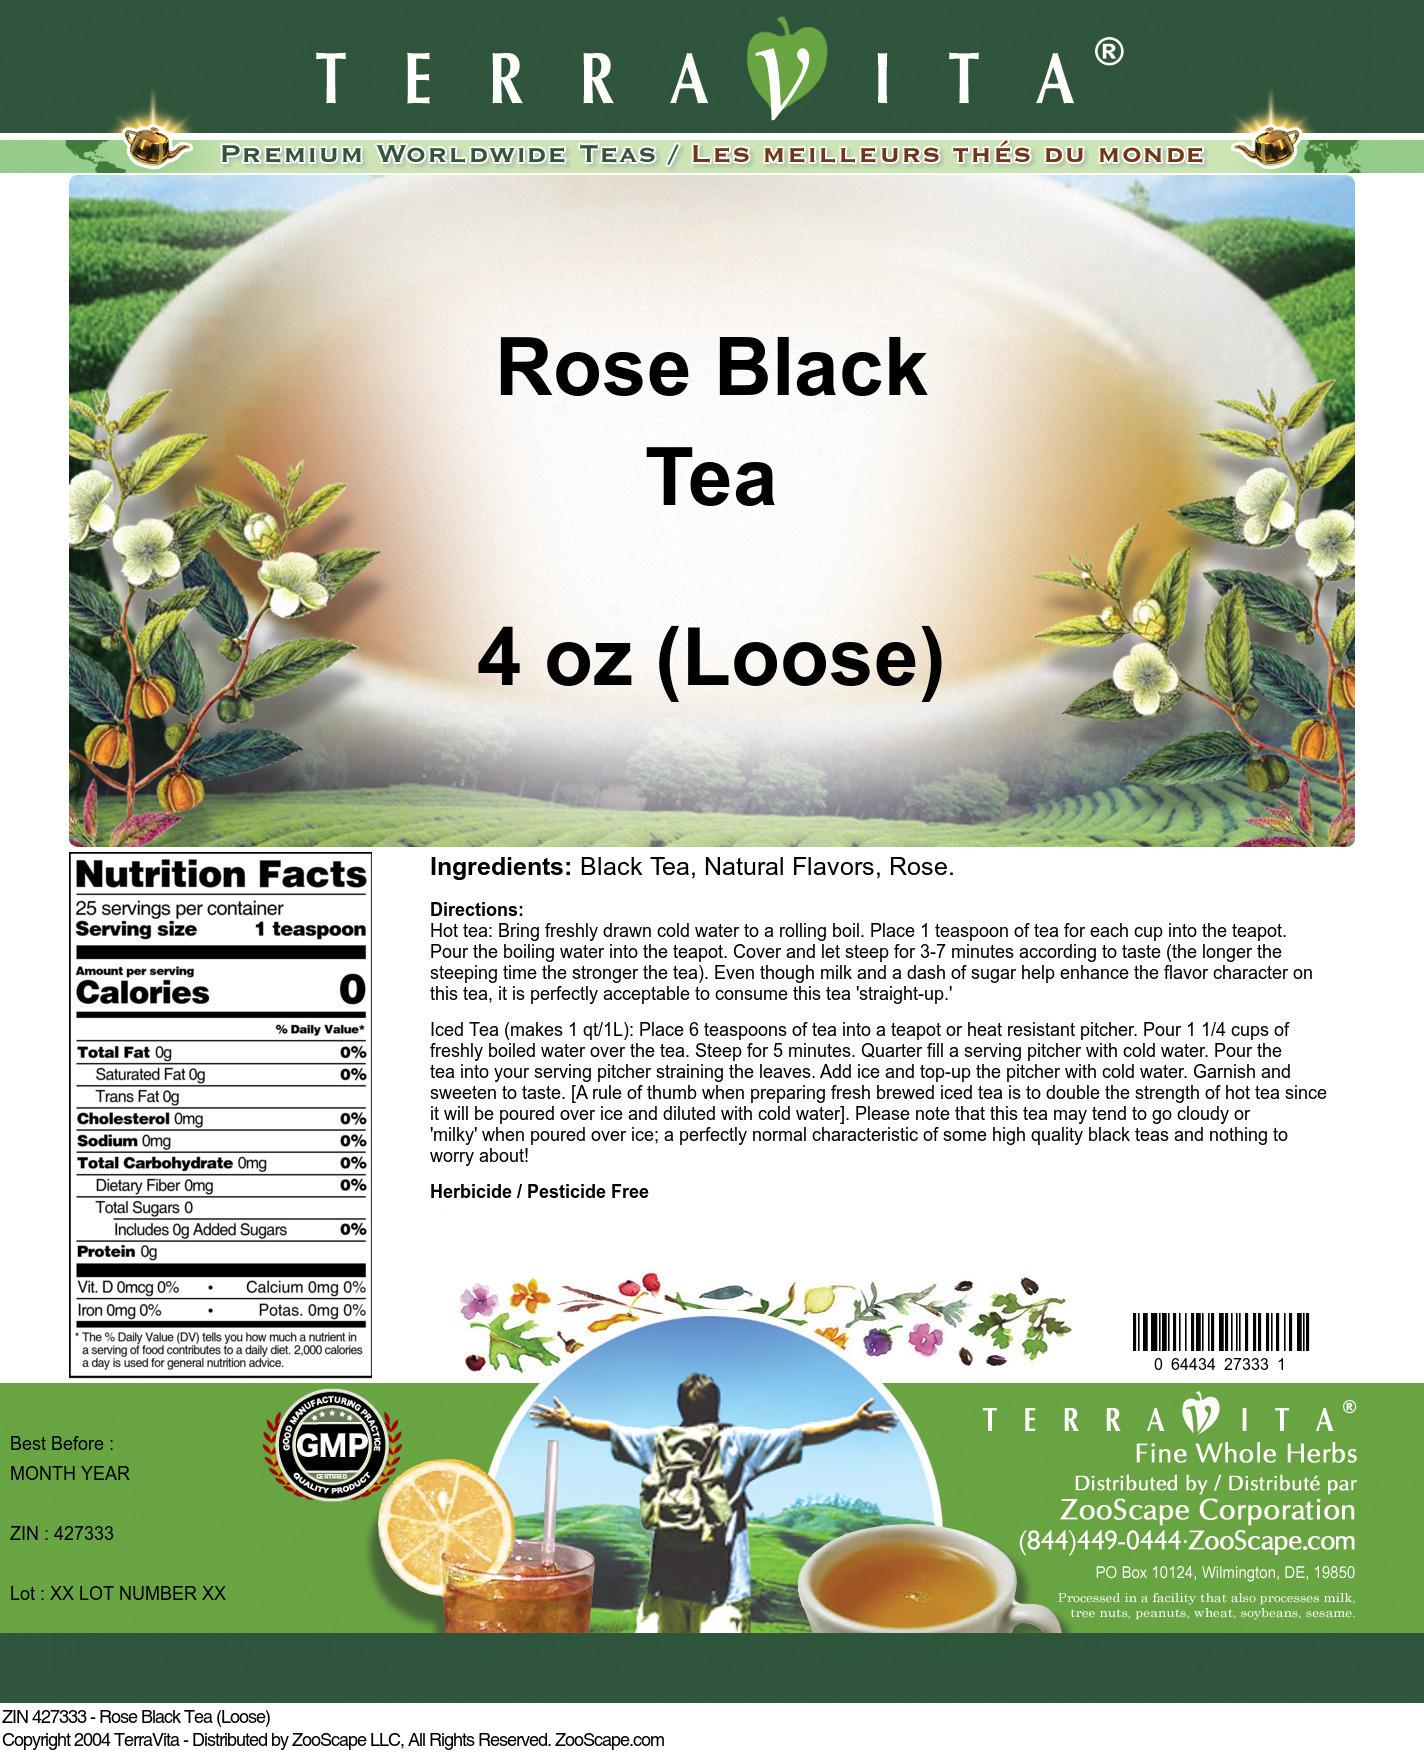 Rose Black Tea (Loose)